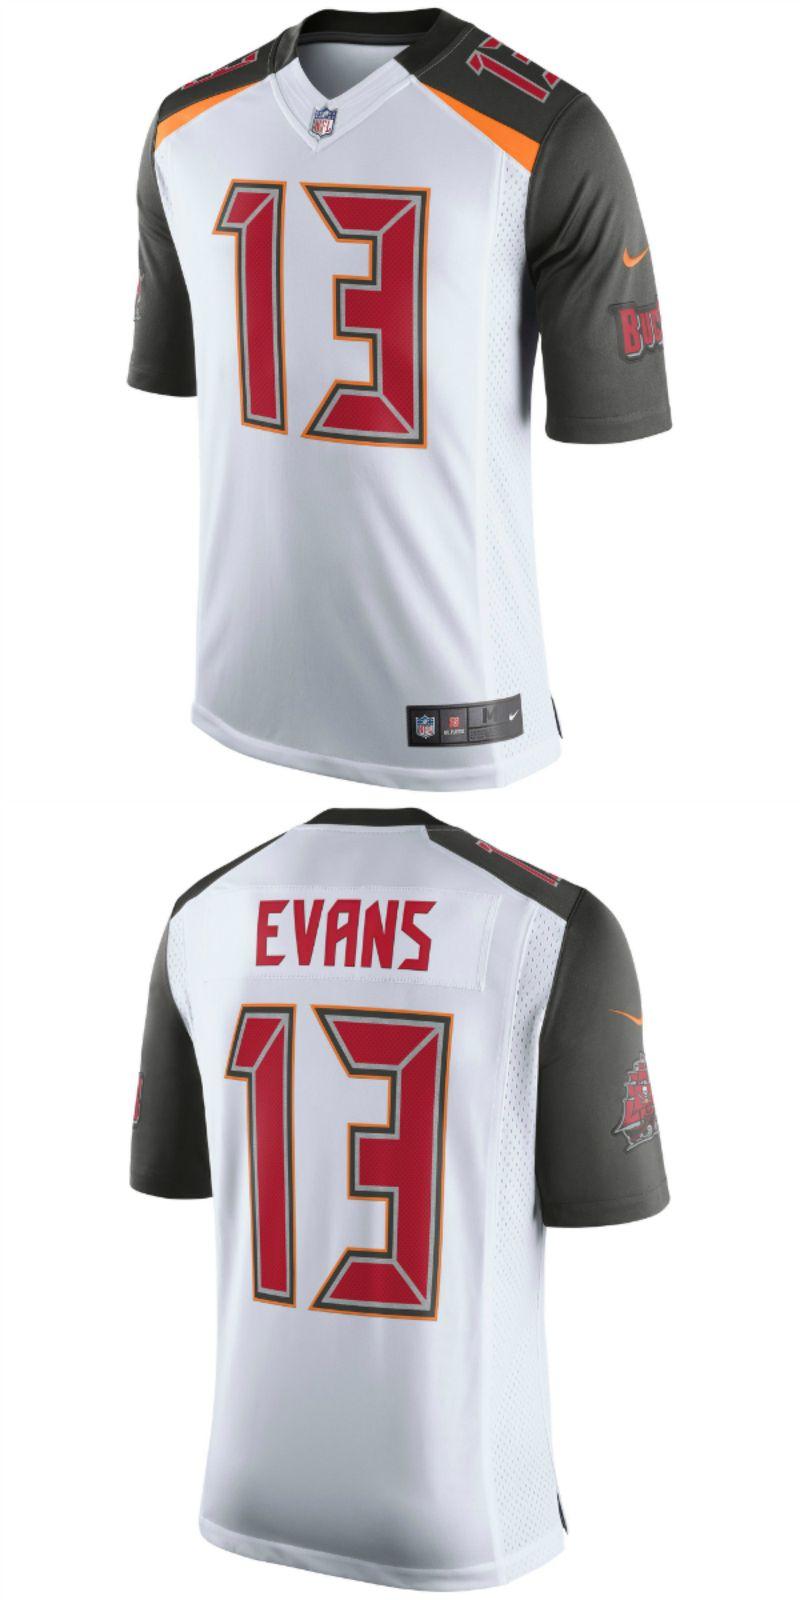 Mike Evans Tampa Bay Buccaneers Football Jersey.